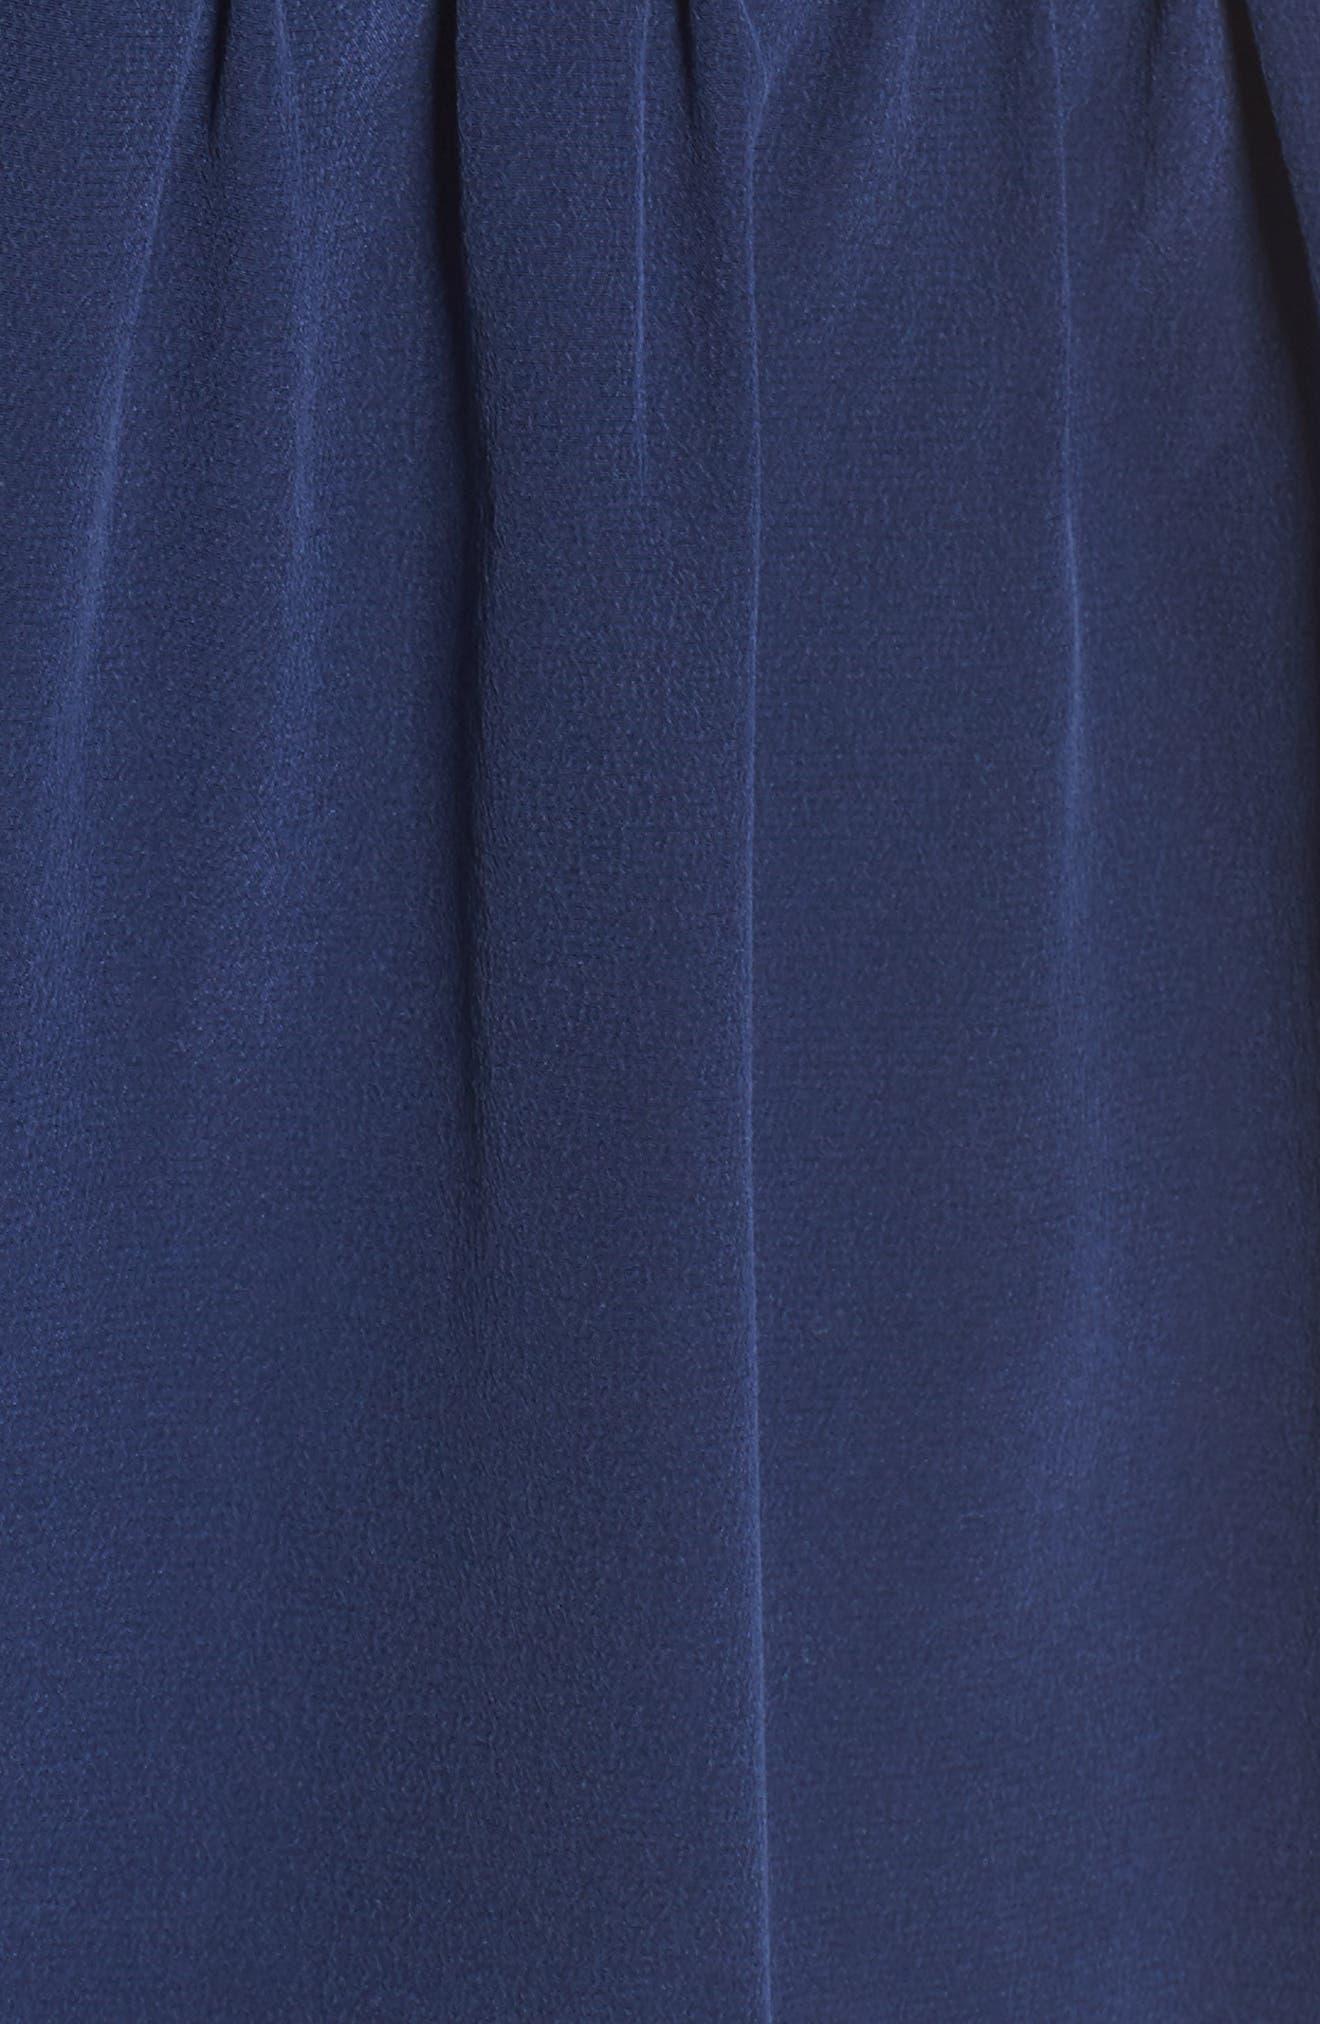 Bilson Fit & Flare Silk Dress,                             Alternate thumbnail 6, color,                             Marine